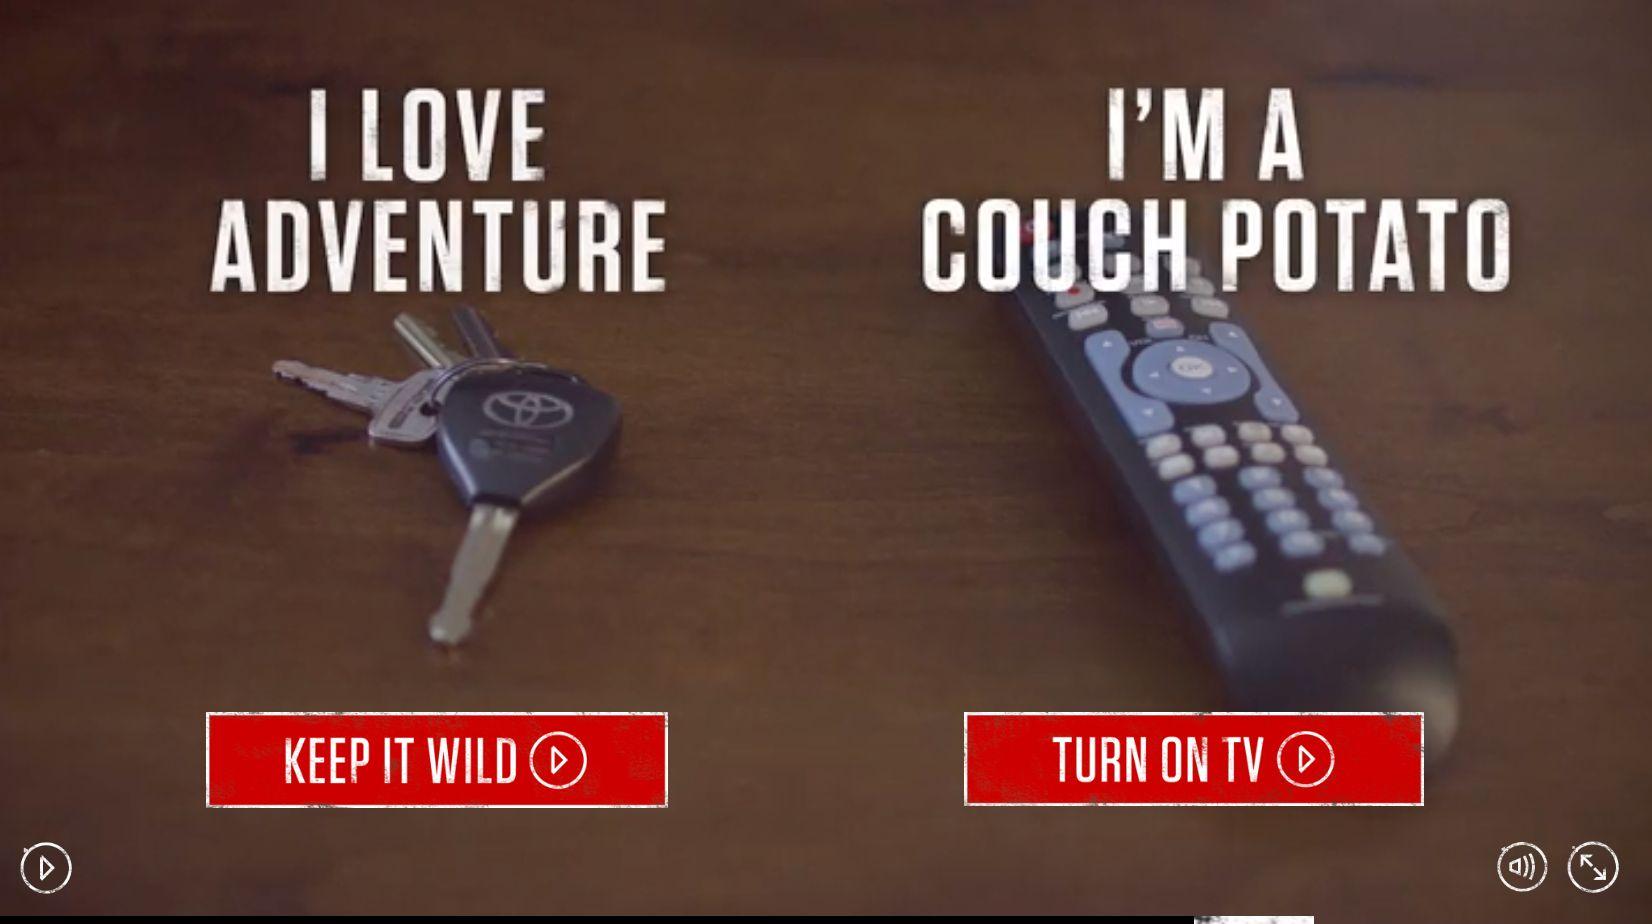 Toyota interactive video screenshot